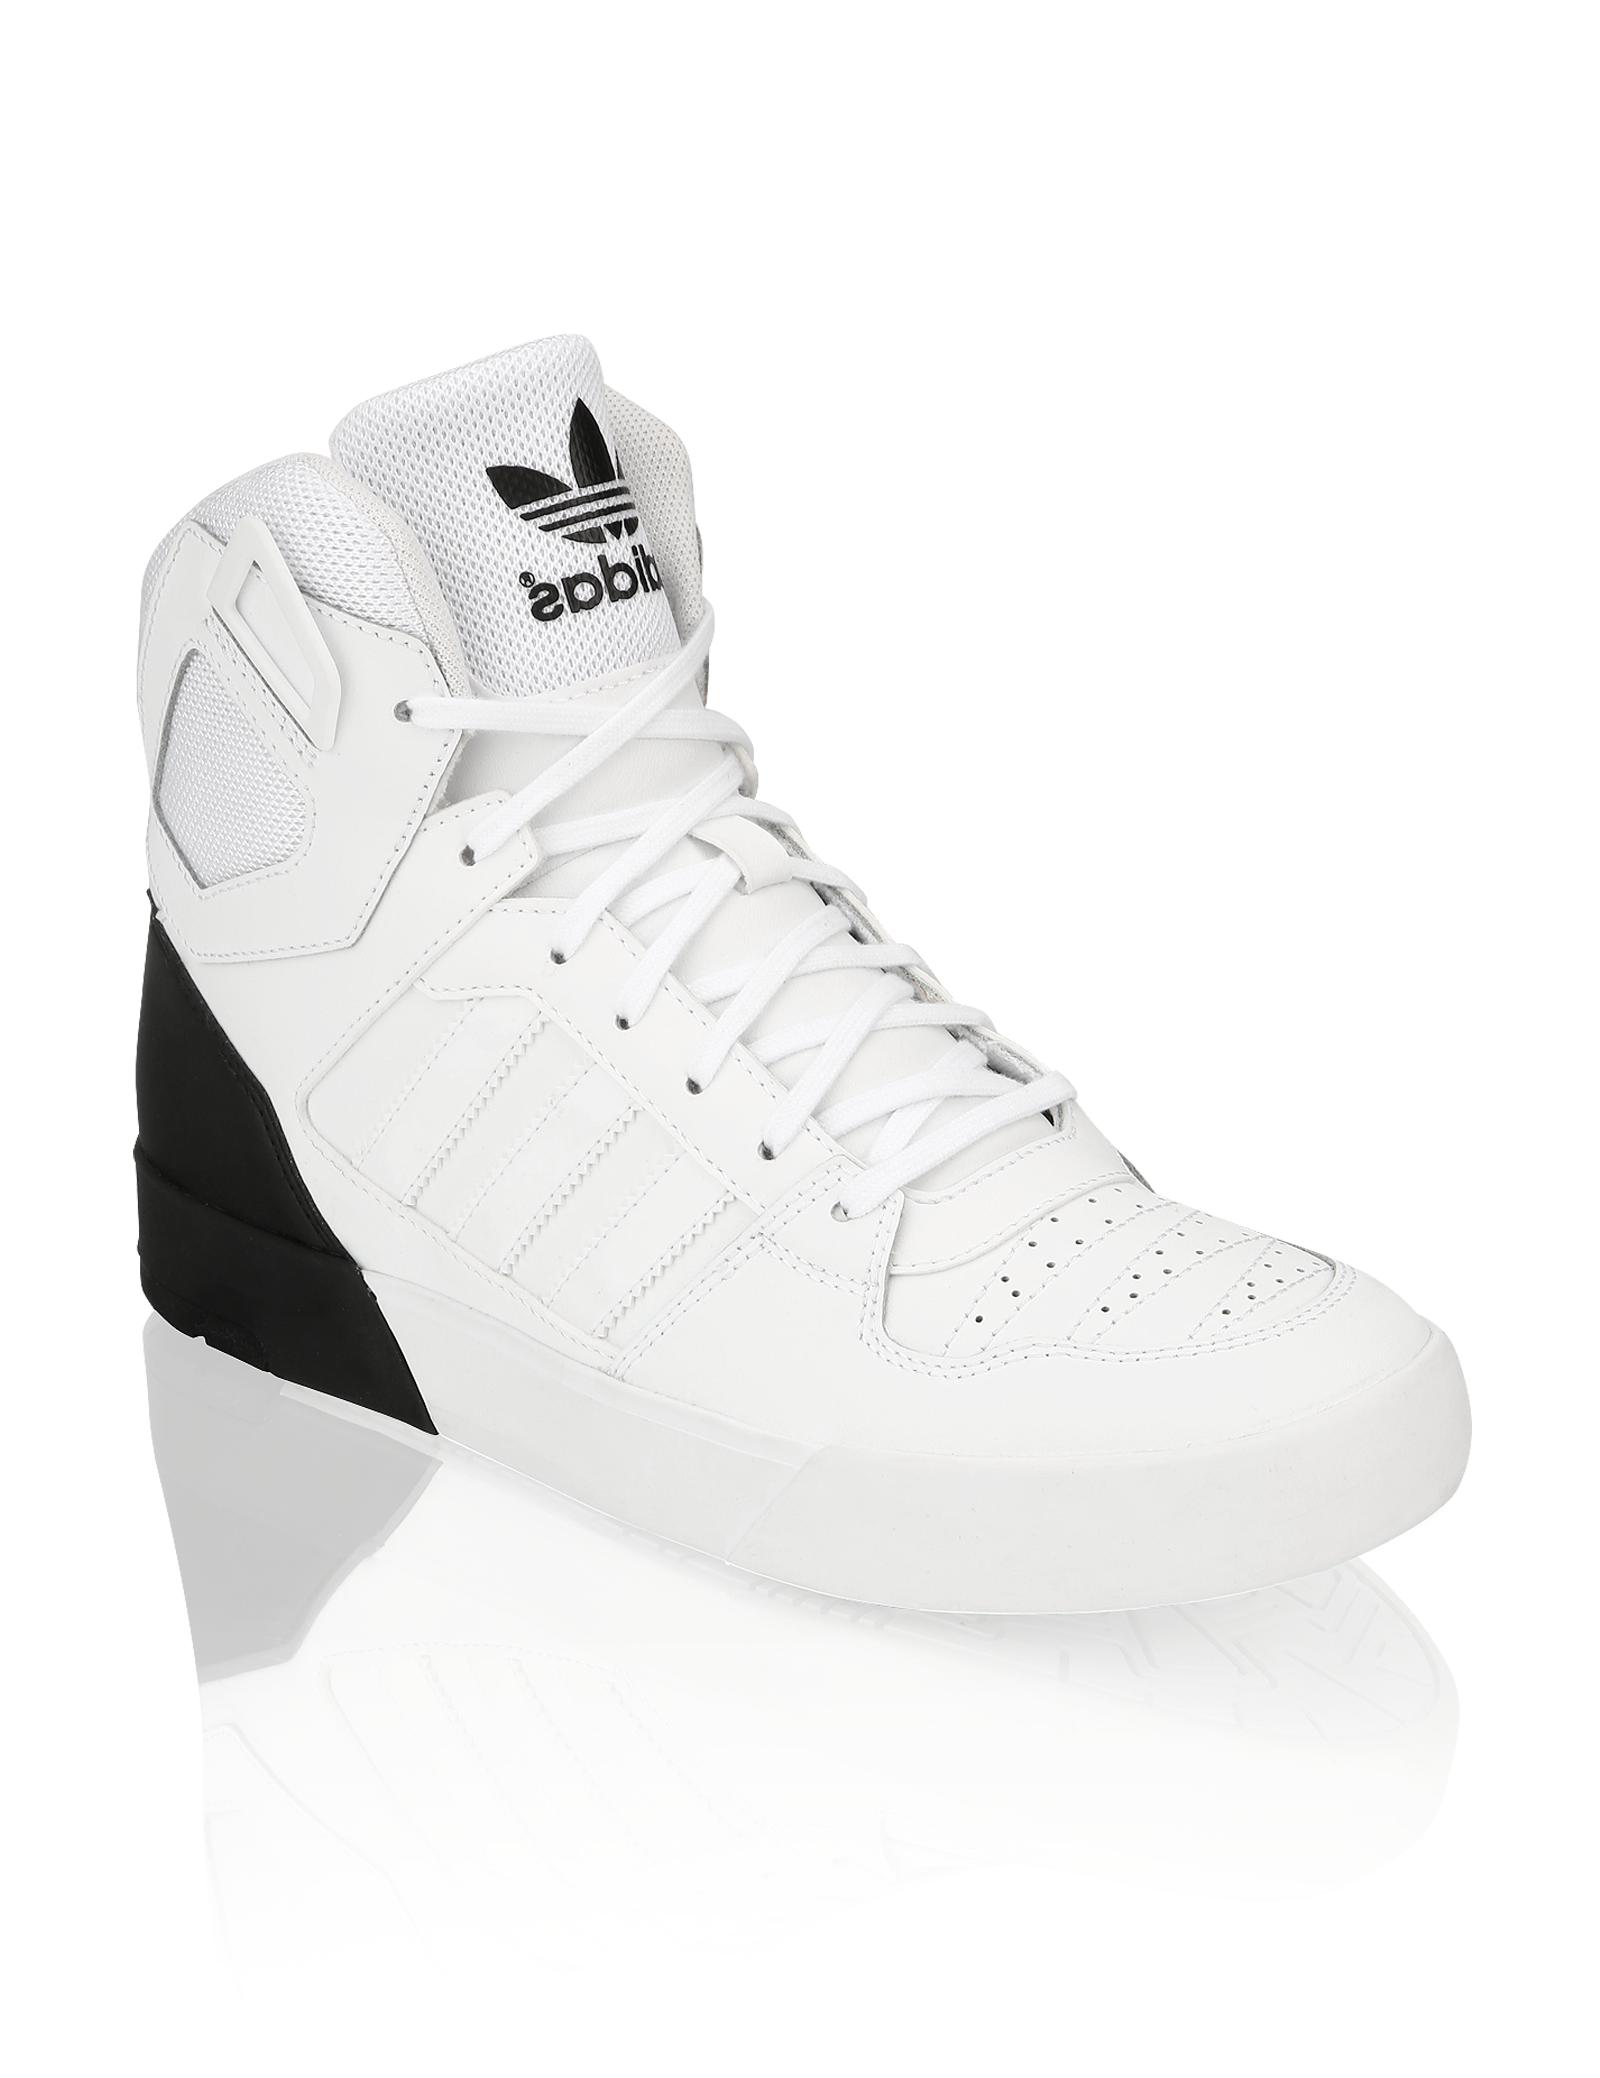 Adidas Originals Zestra http:///at/Damen HUMANIC http:///at/Damen Zestra e85cfb